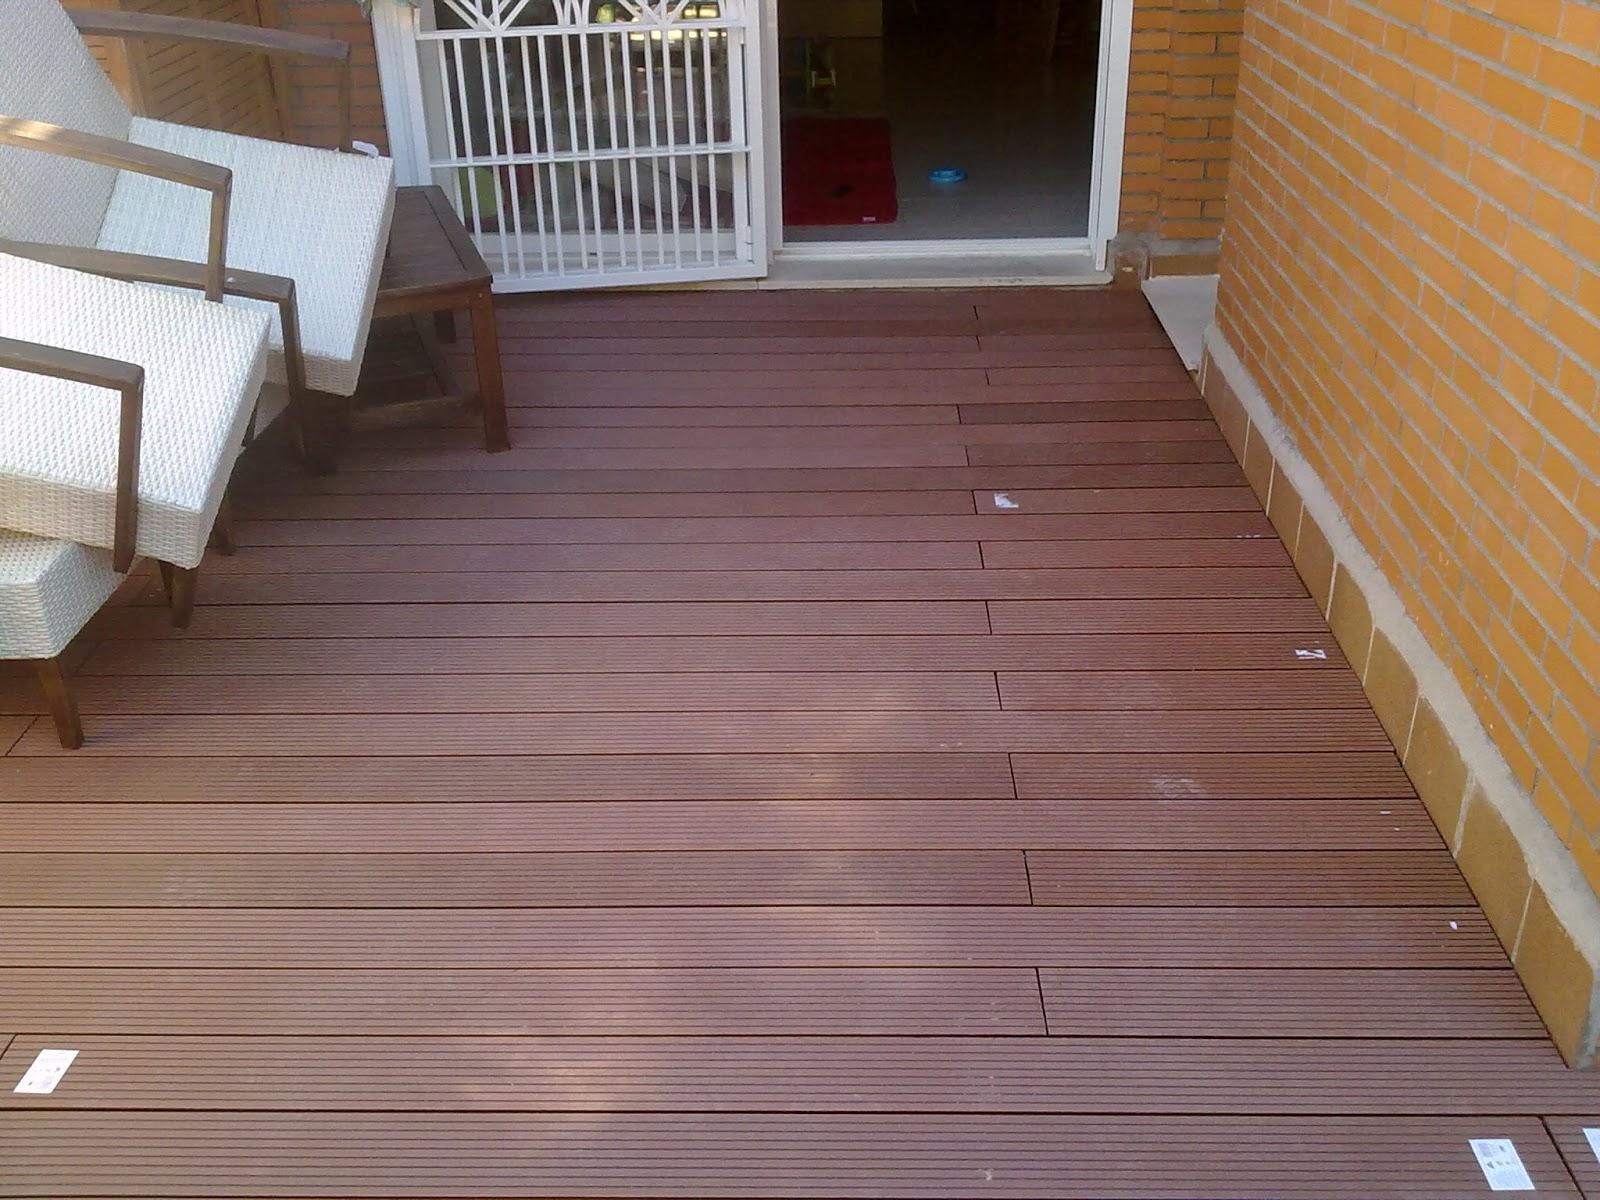 Miguel garcia carpintero suelo de composite en terraza for Suelo de madera terraza